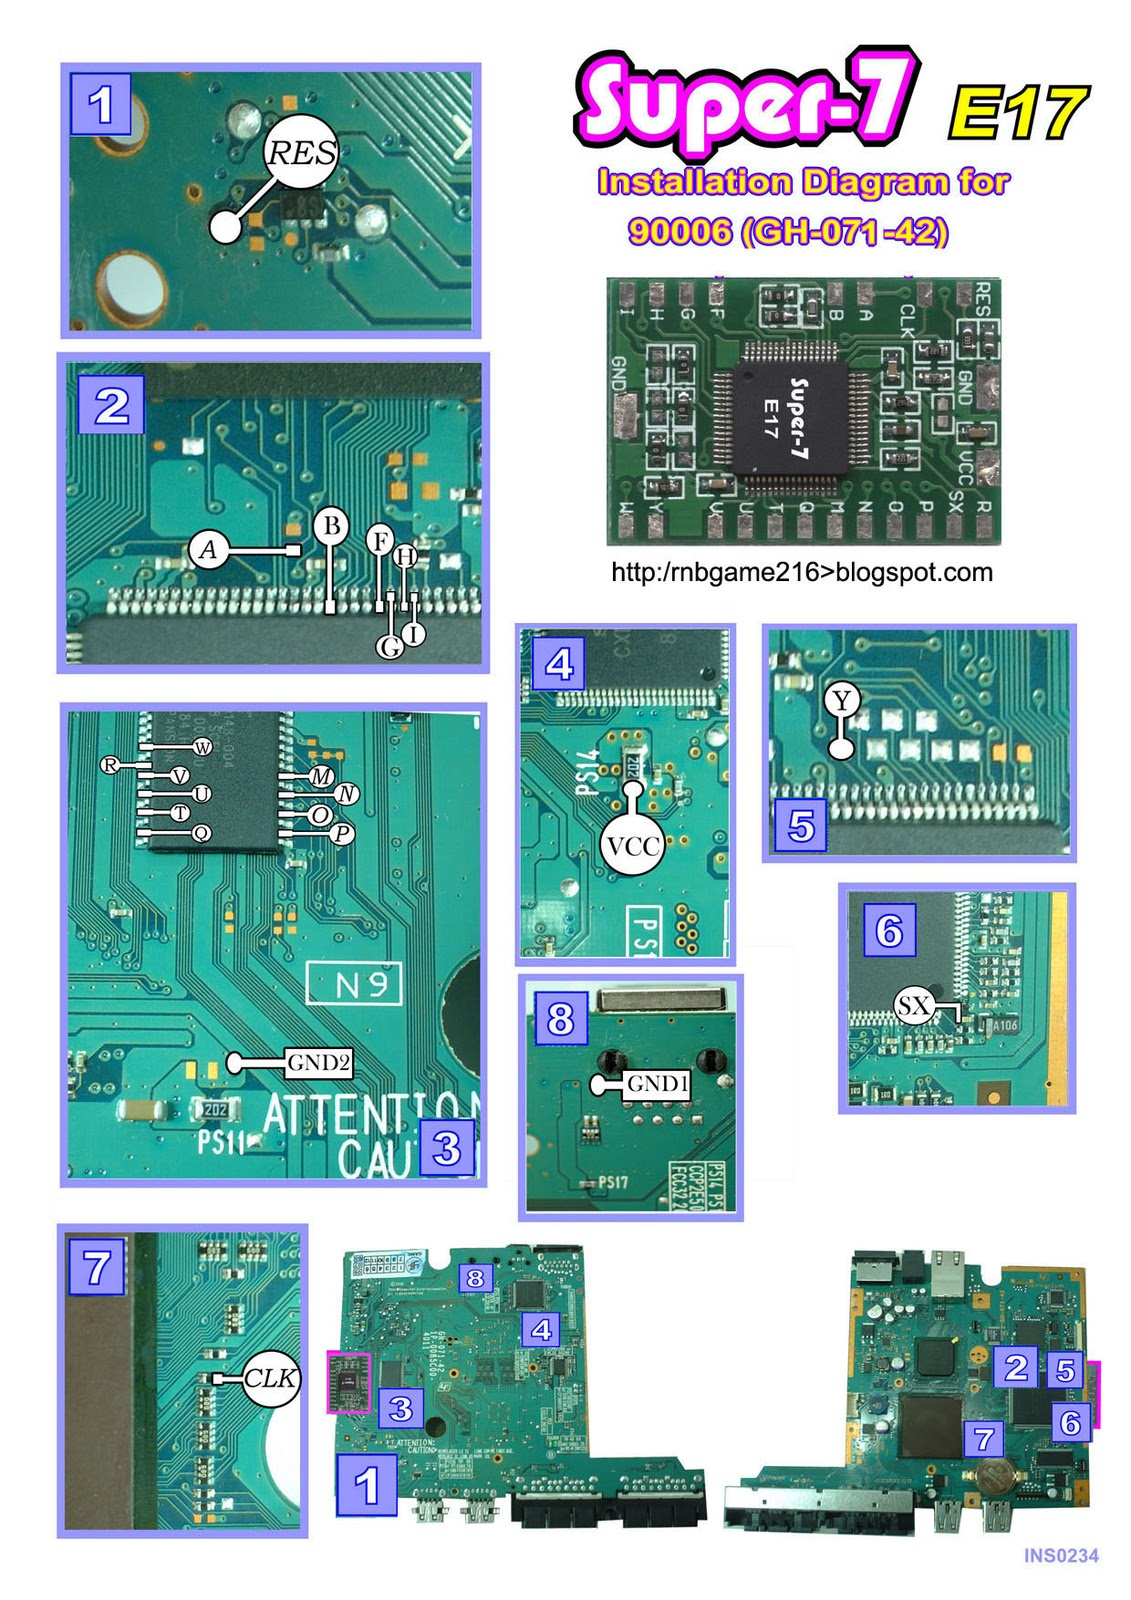 Tutorial PS2: Diagram Pemasangan IC Super 7 E17